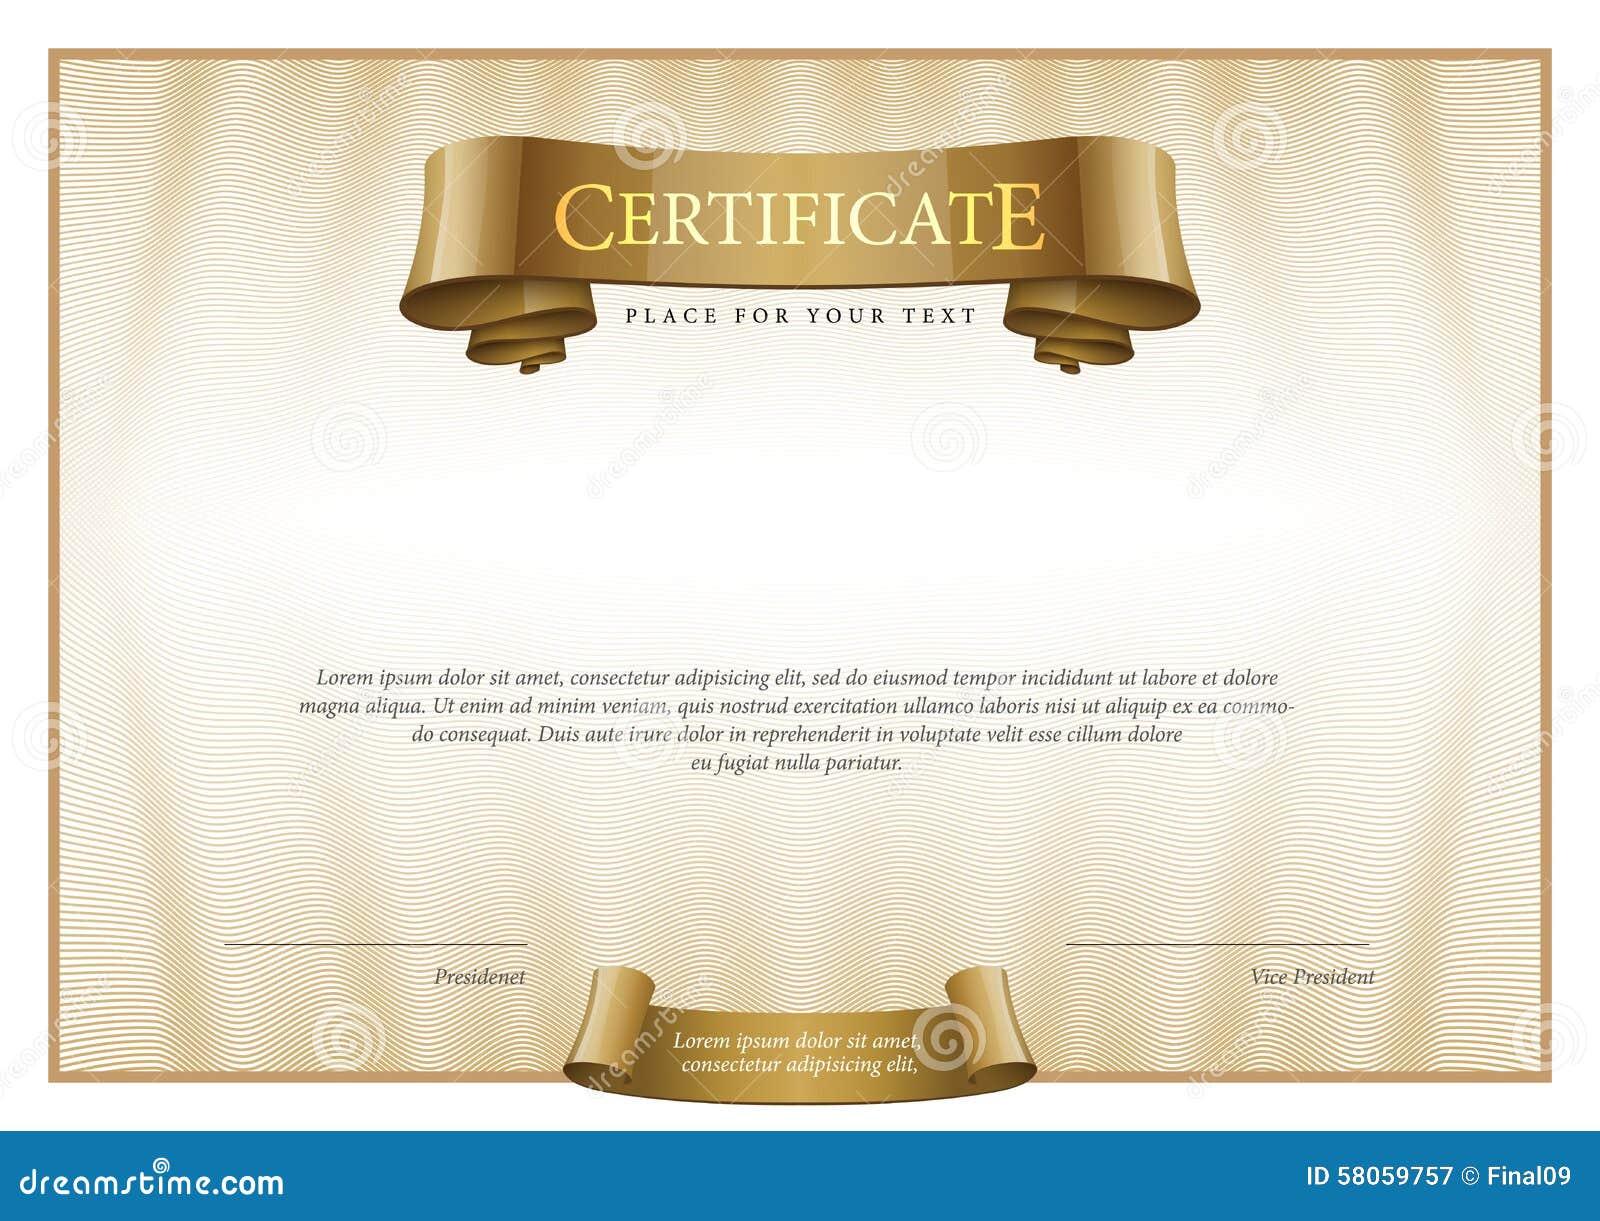 Vintage Certificate Template Mandegarfo